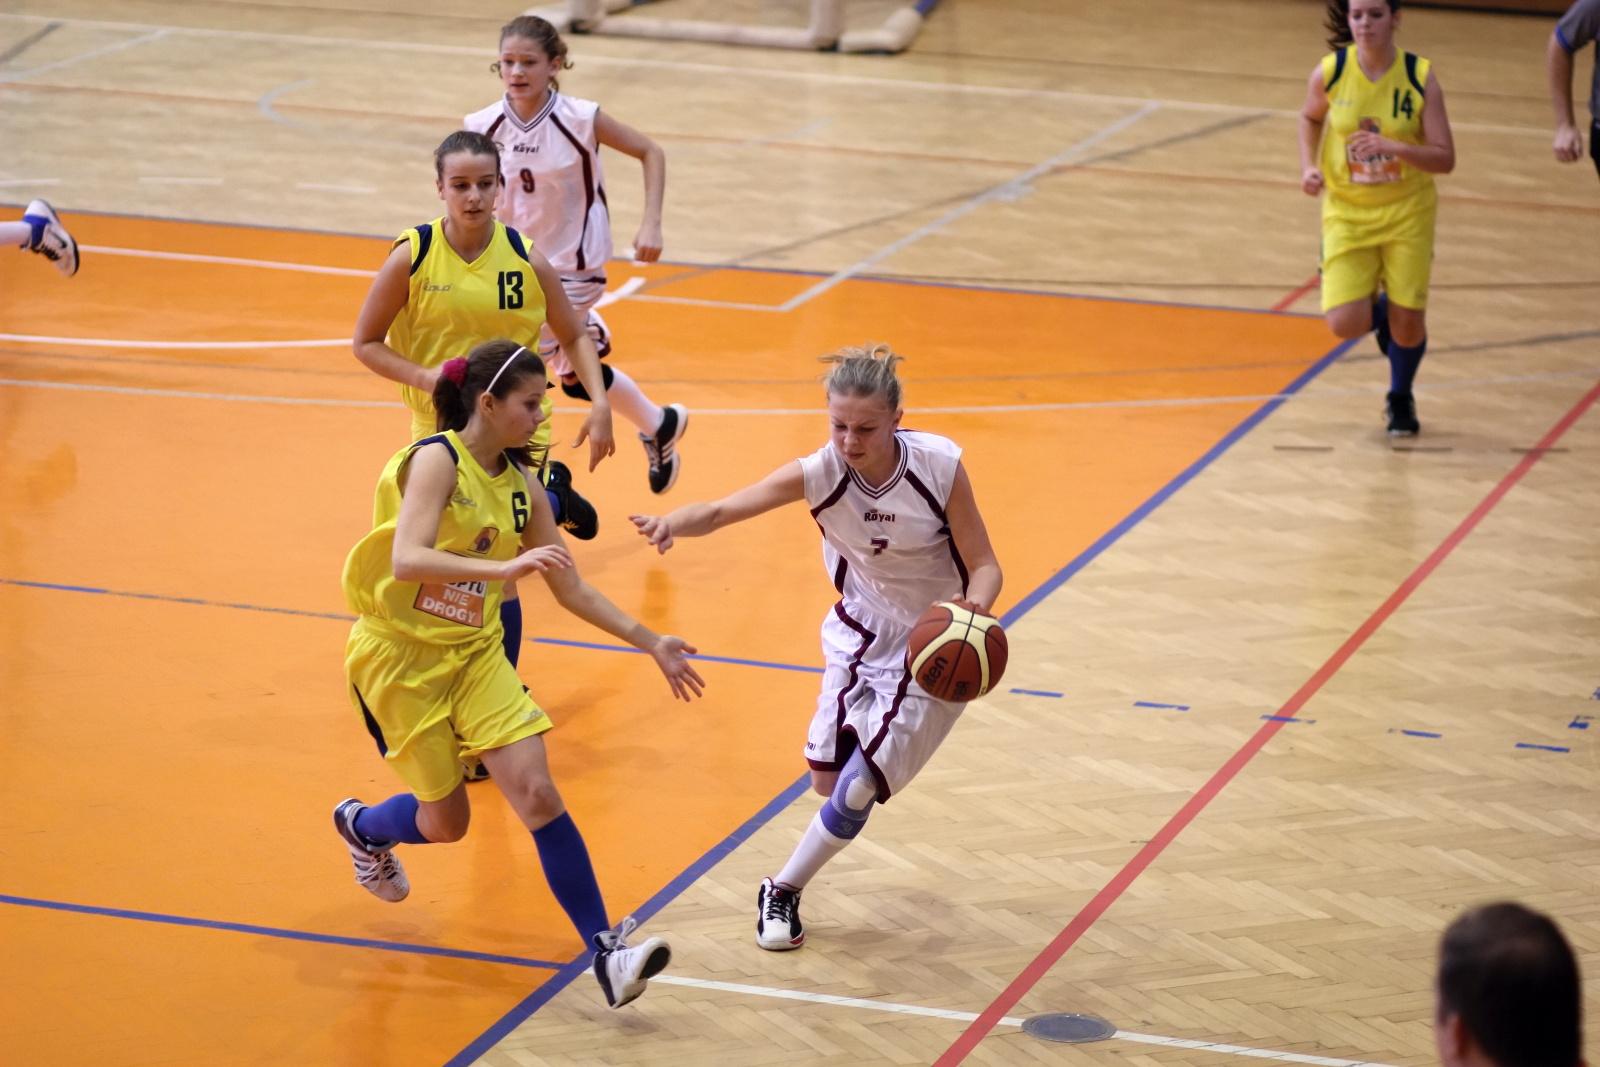 bk-zvolen-tydam-kosice-ziacky-basketbal-2011-18